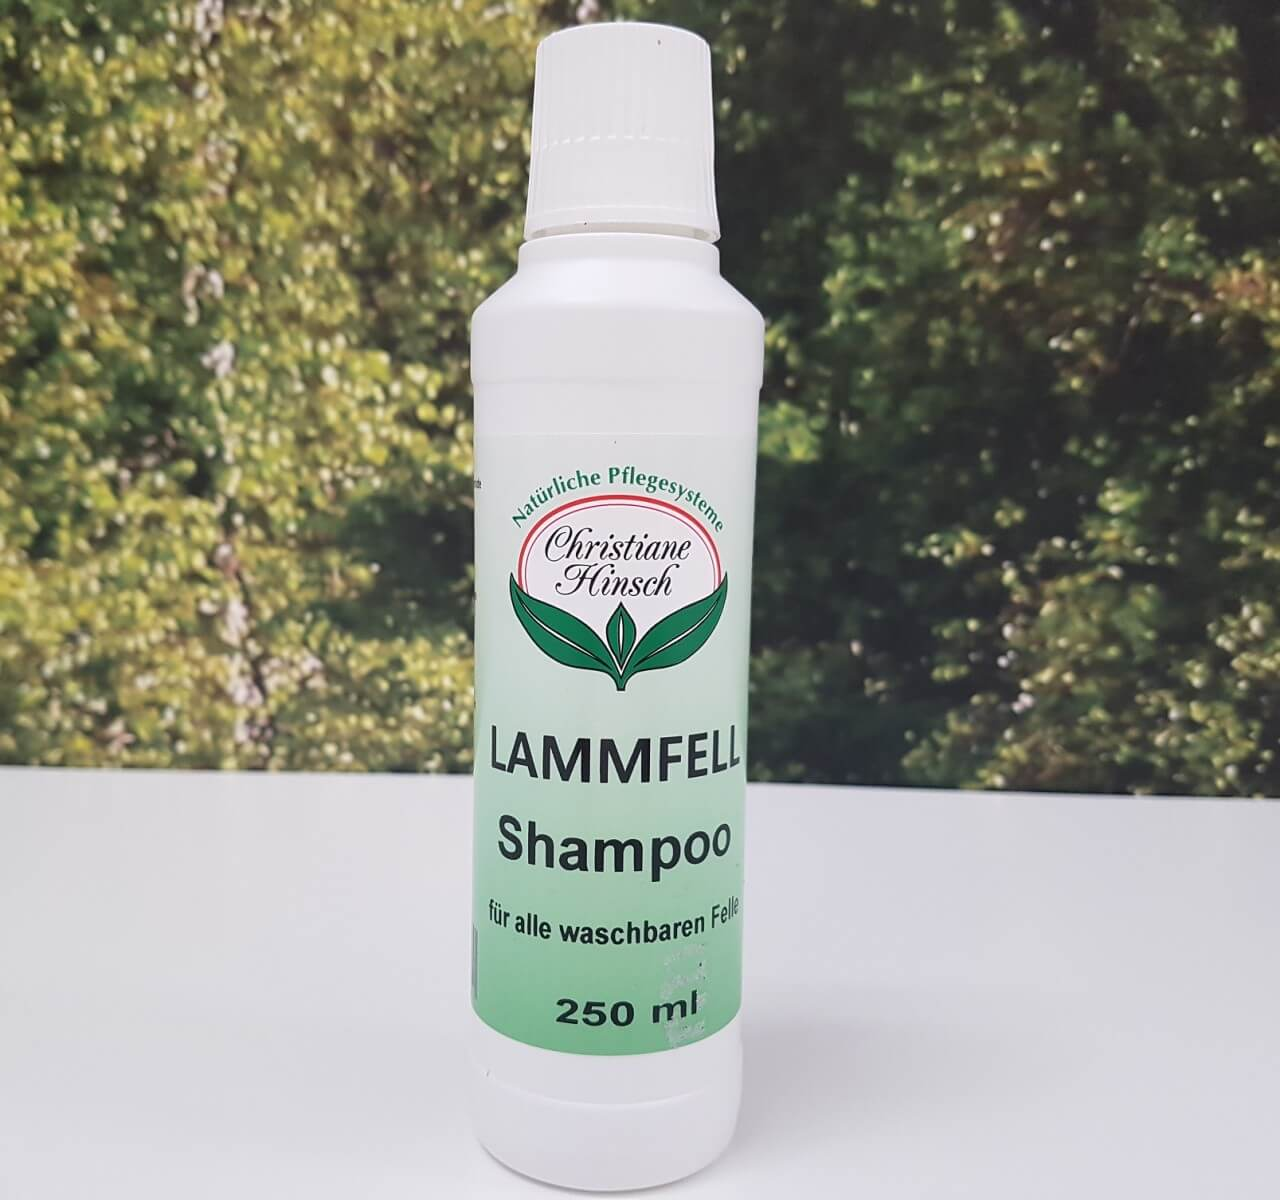 Lammfell Shampoo 250 ml